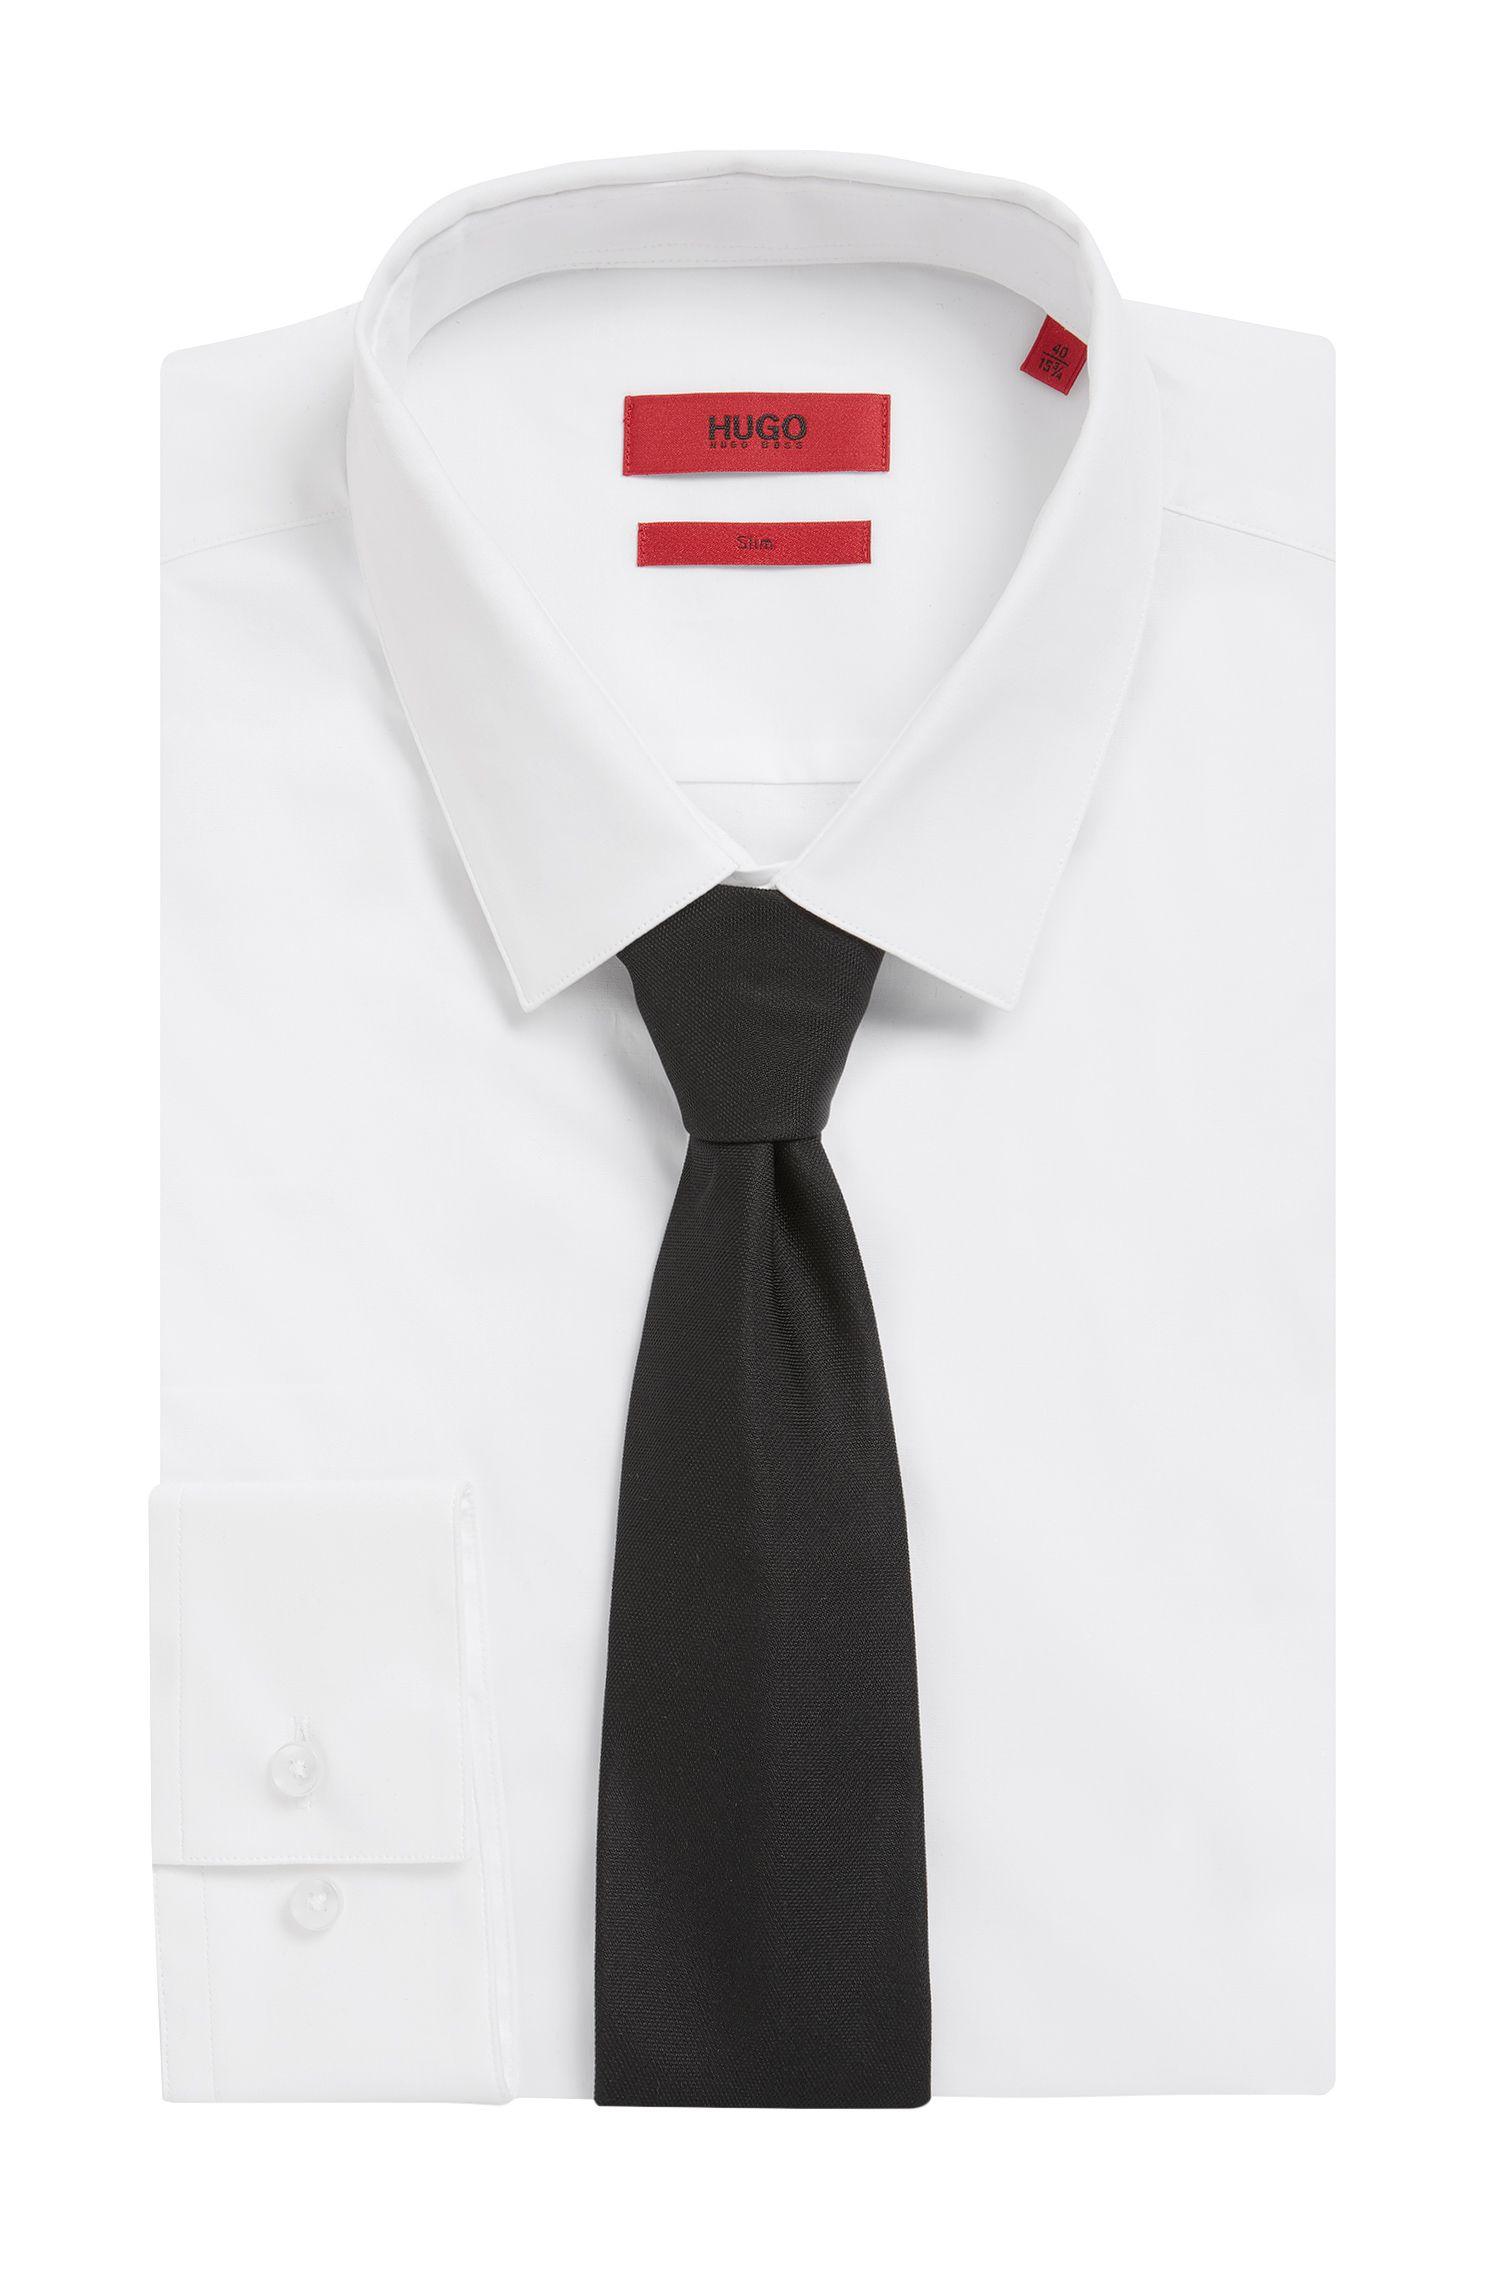 Krawatte aus strukturiertem Seiden-Jacquard